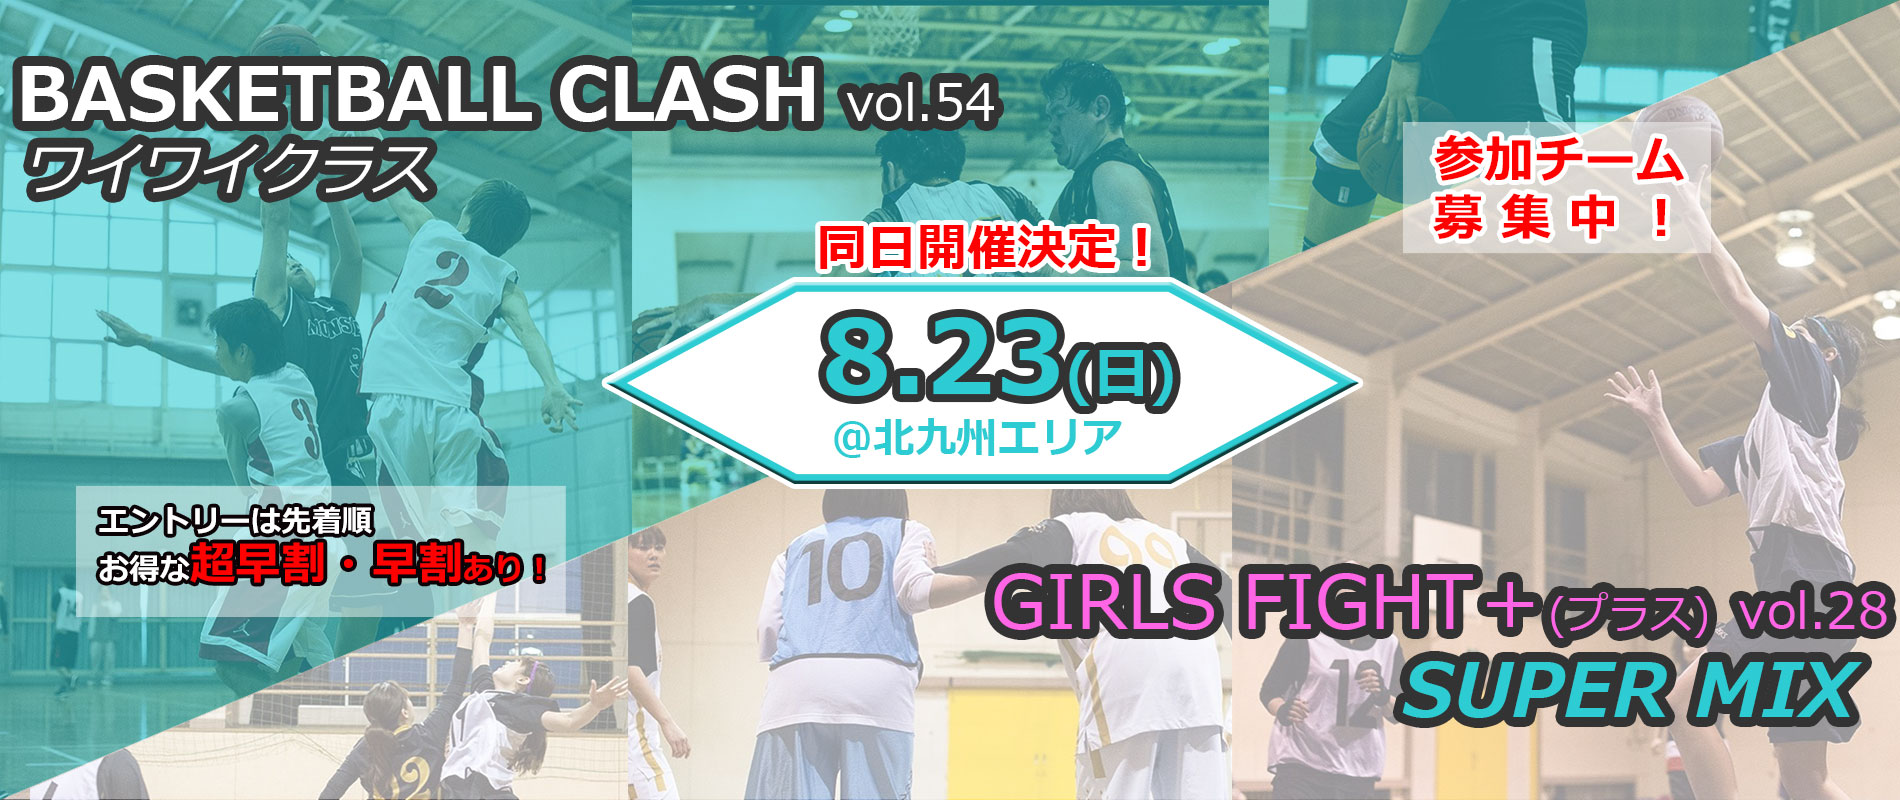 basketball clash